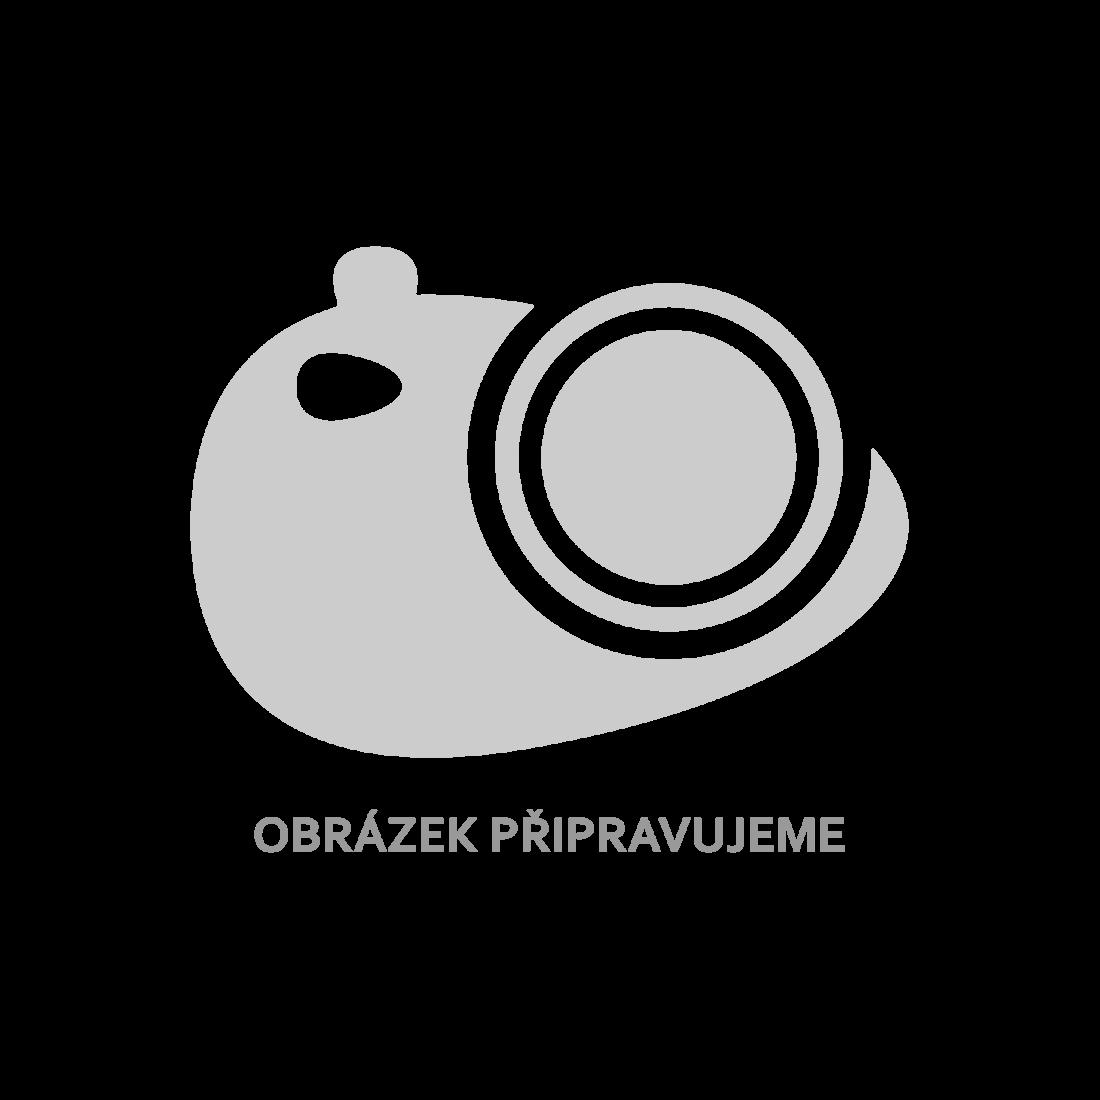 Roleta Zebra / noc a den / Twinroll 120 x 175 cm, kávová